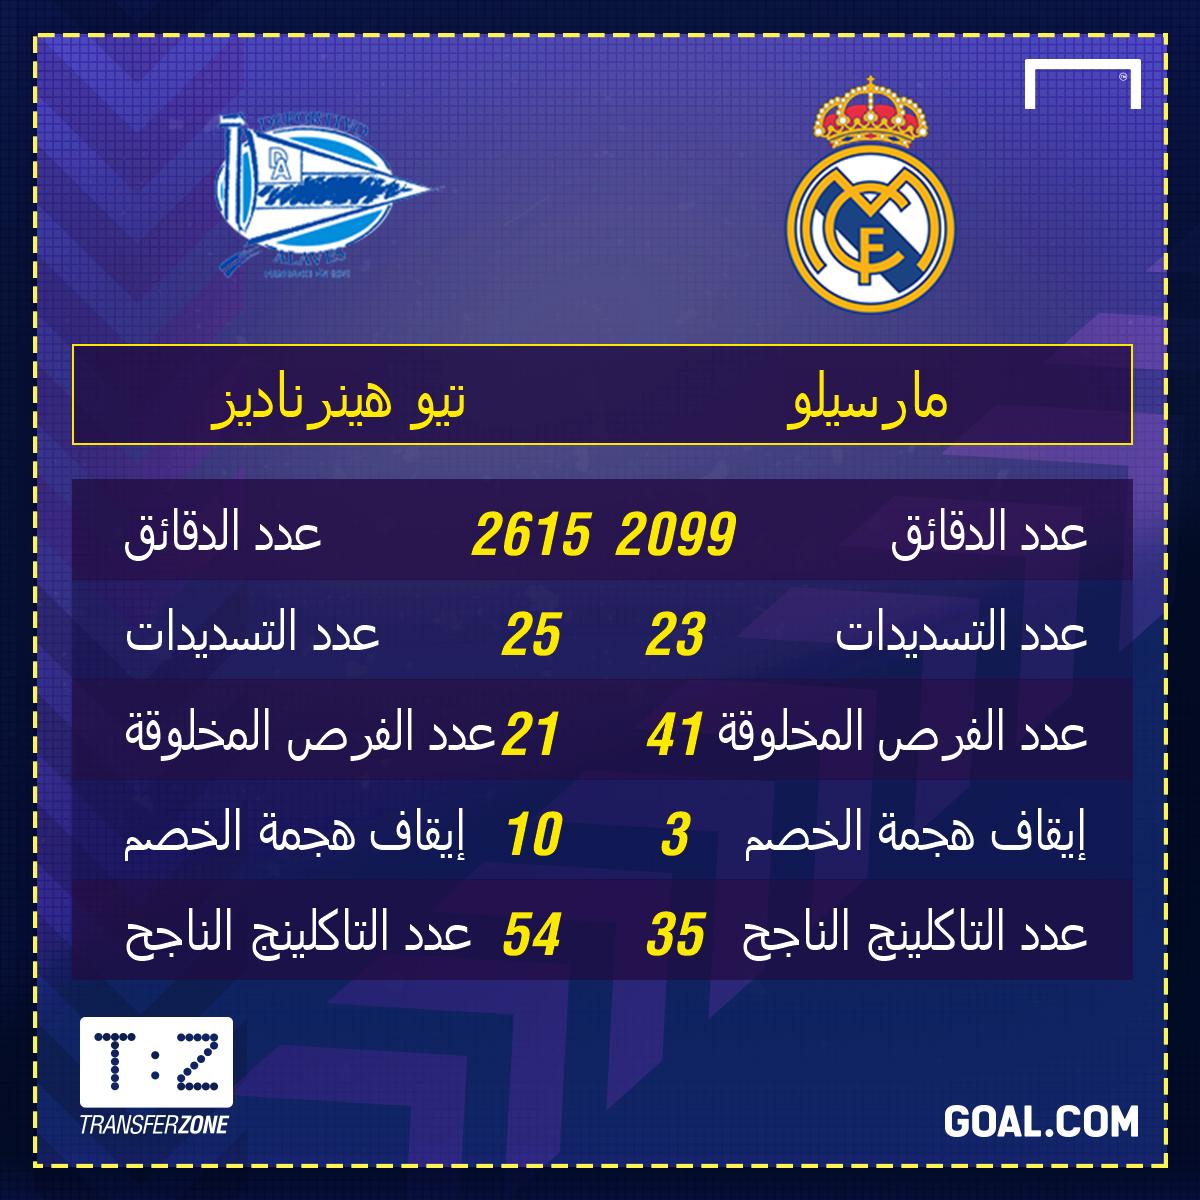 Arabic only: Theo vs Marcelo